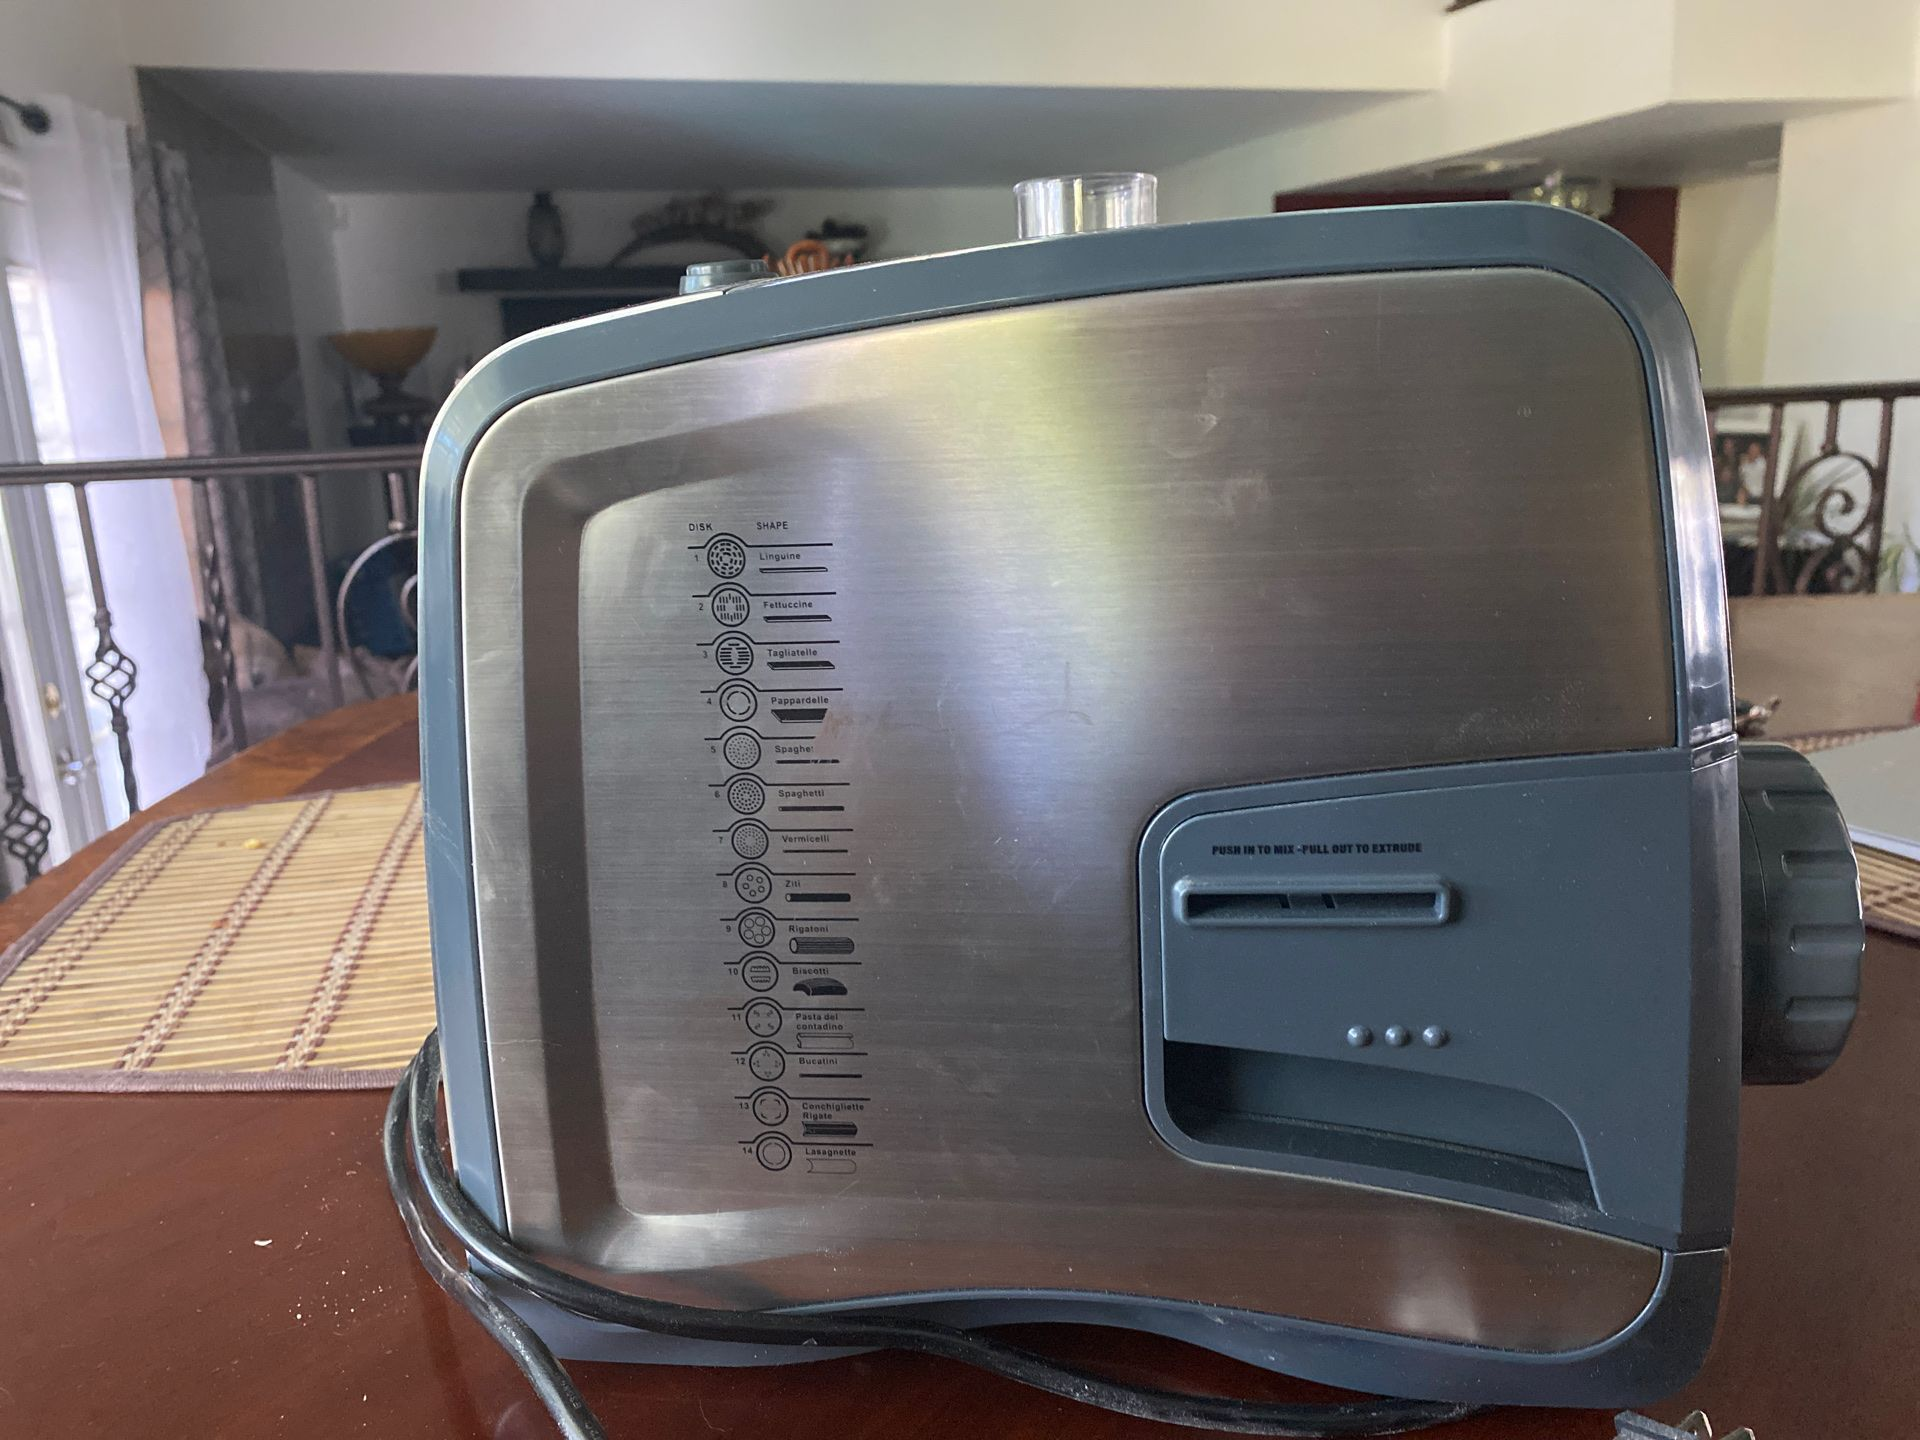 Viante for William- Sonoma Pasta maker